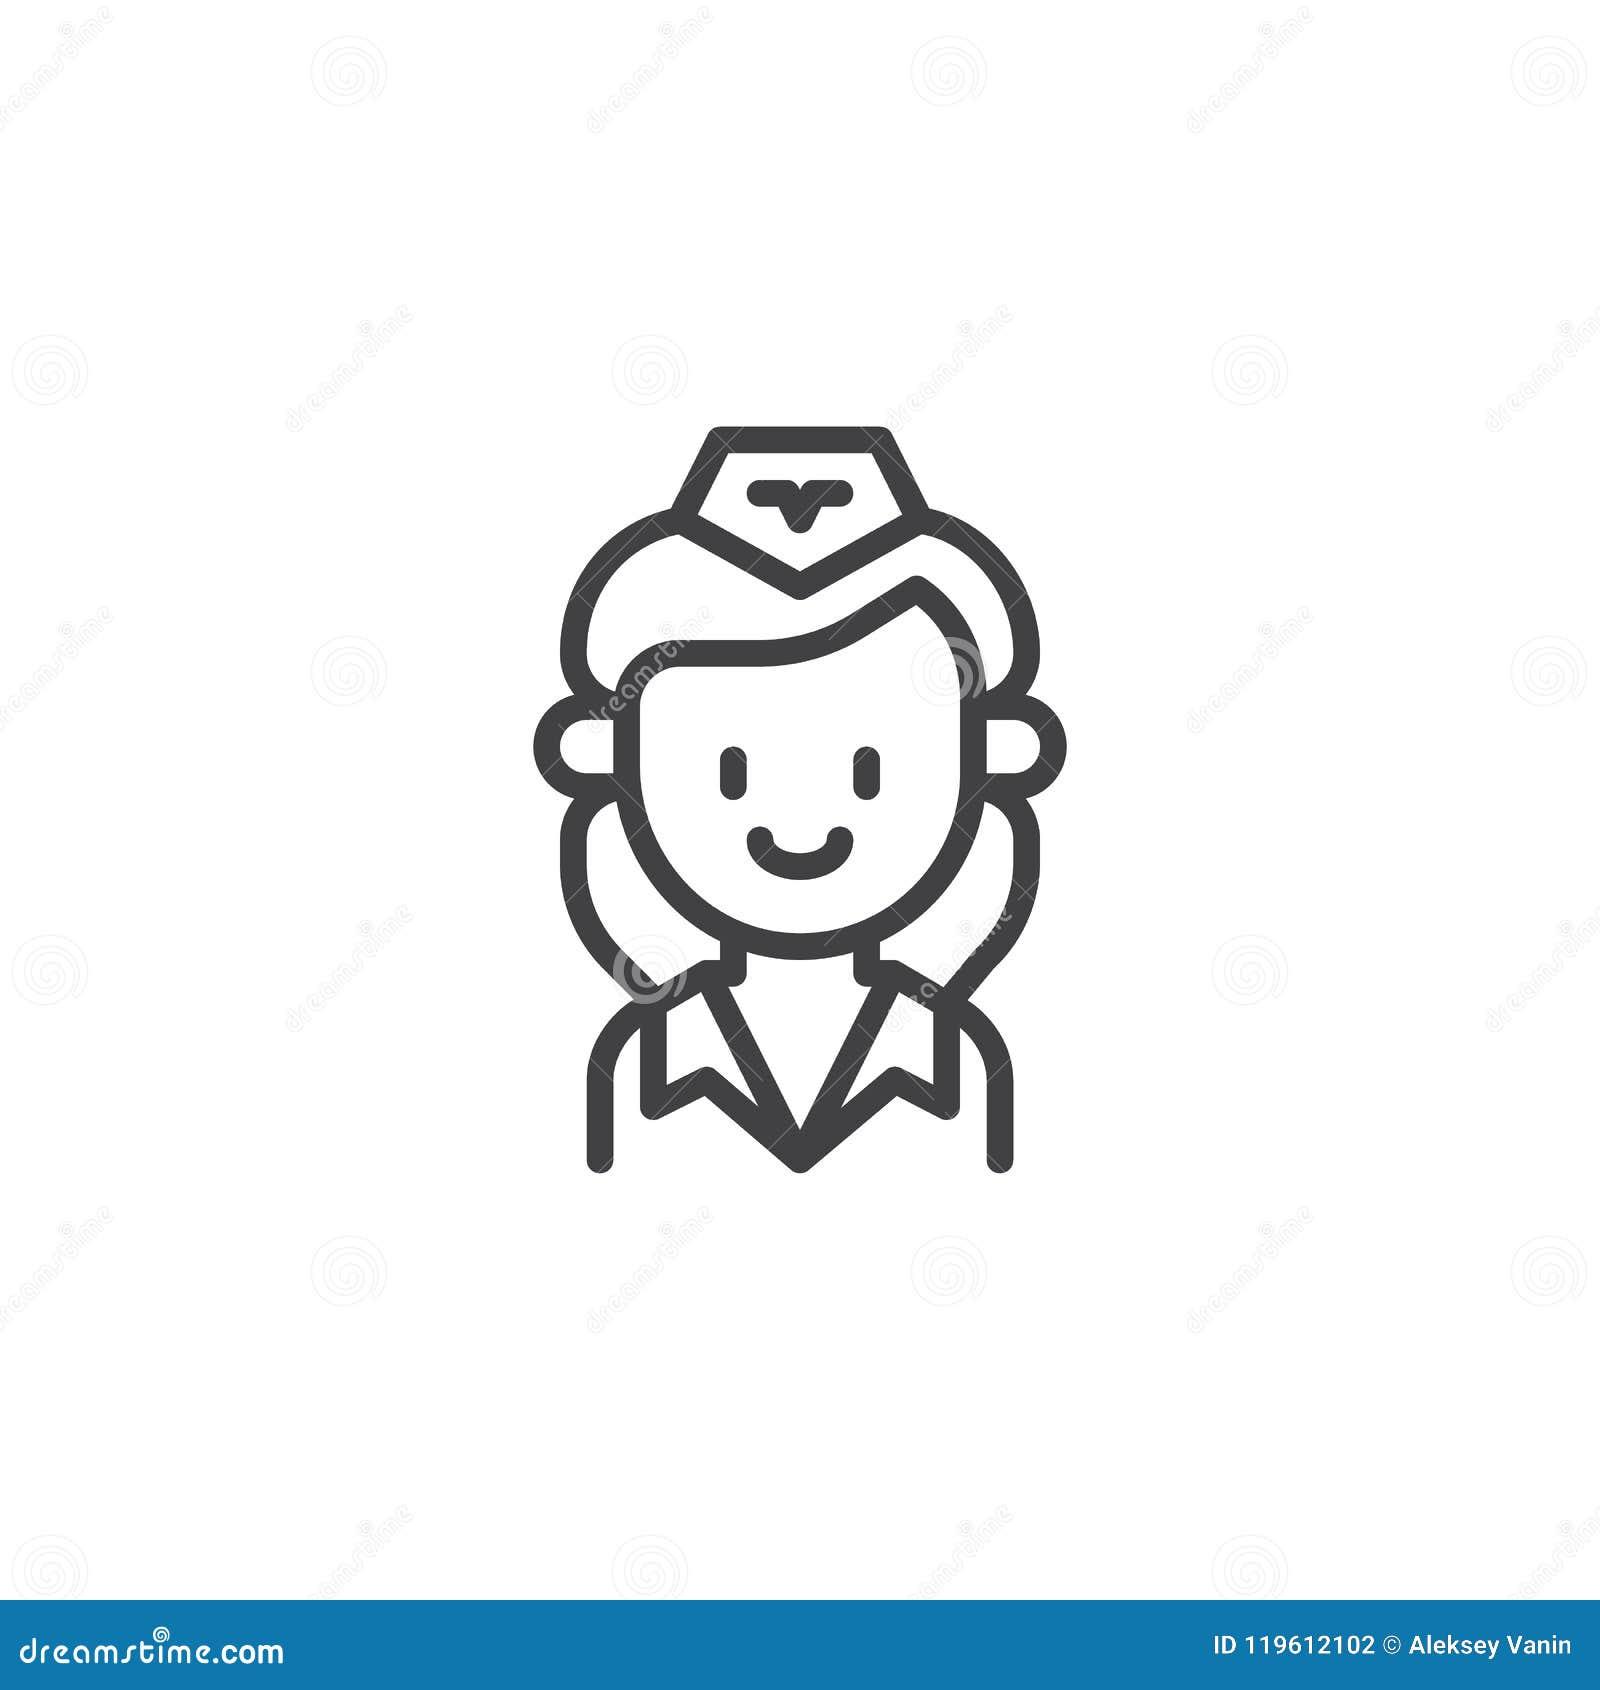 Stewardess Outline Icon Stock Vector Illustration Of Stewardess